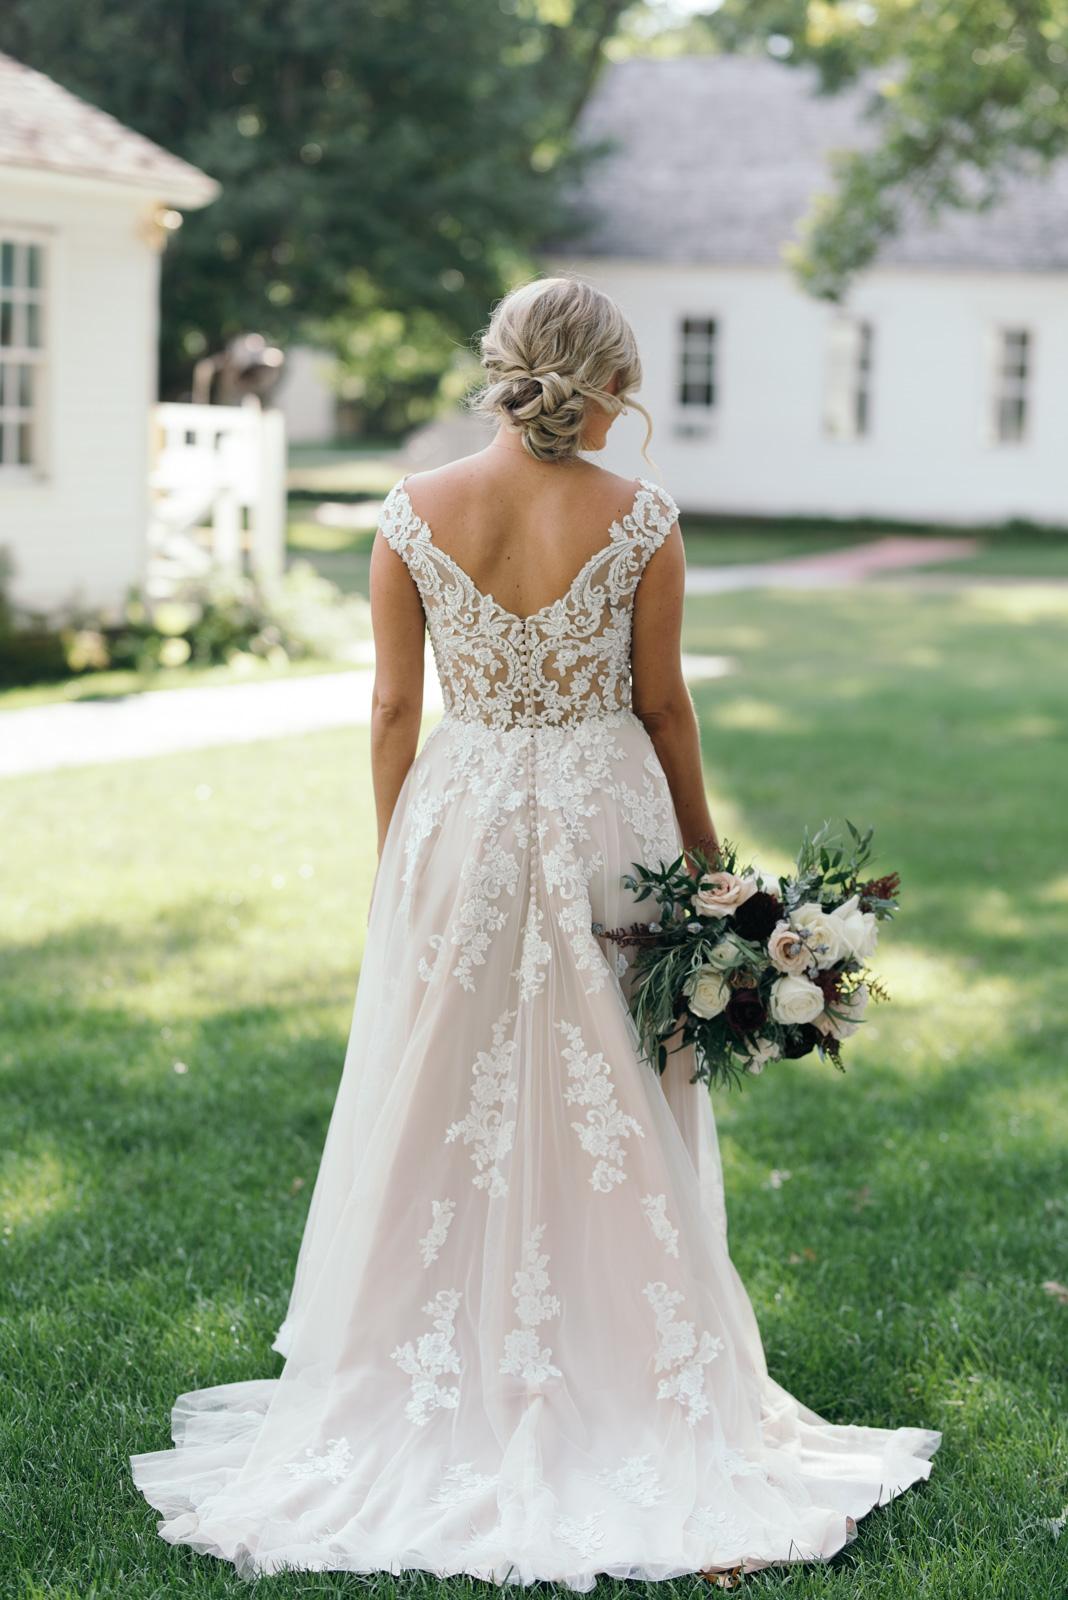 back of brides dress Ushers Ferry Historic Village wedding